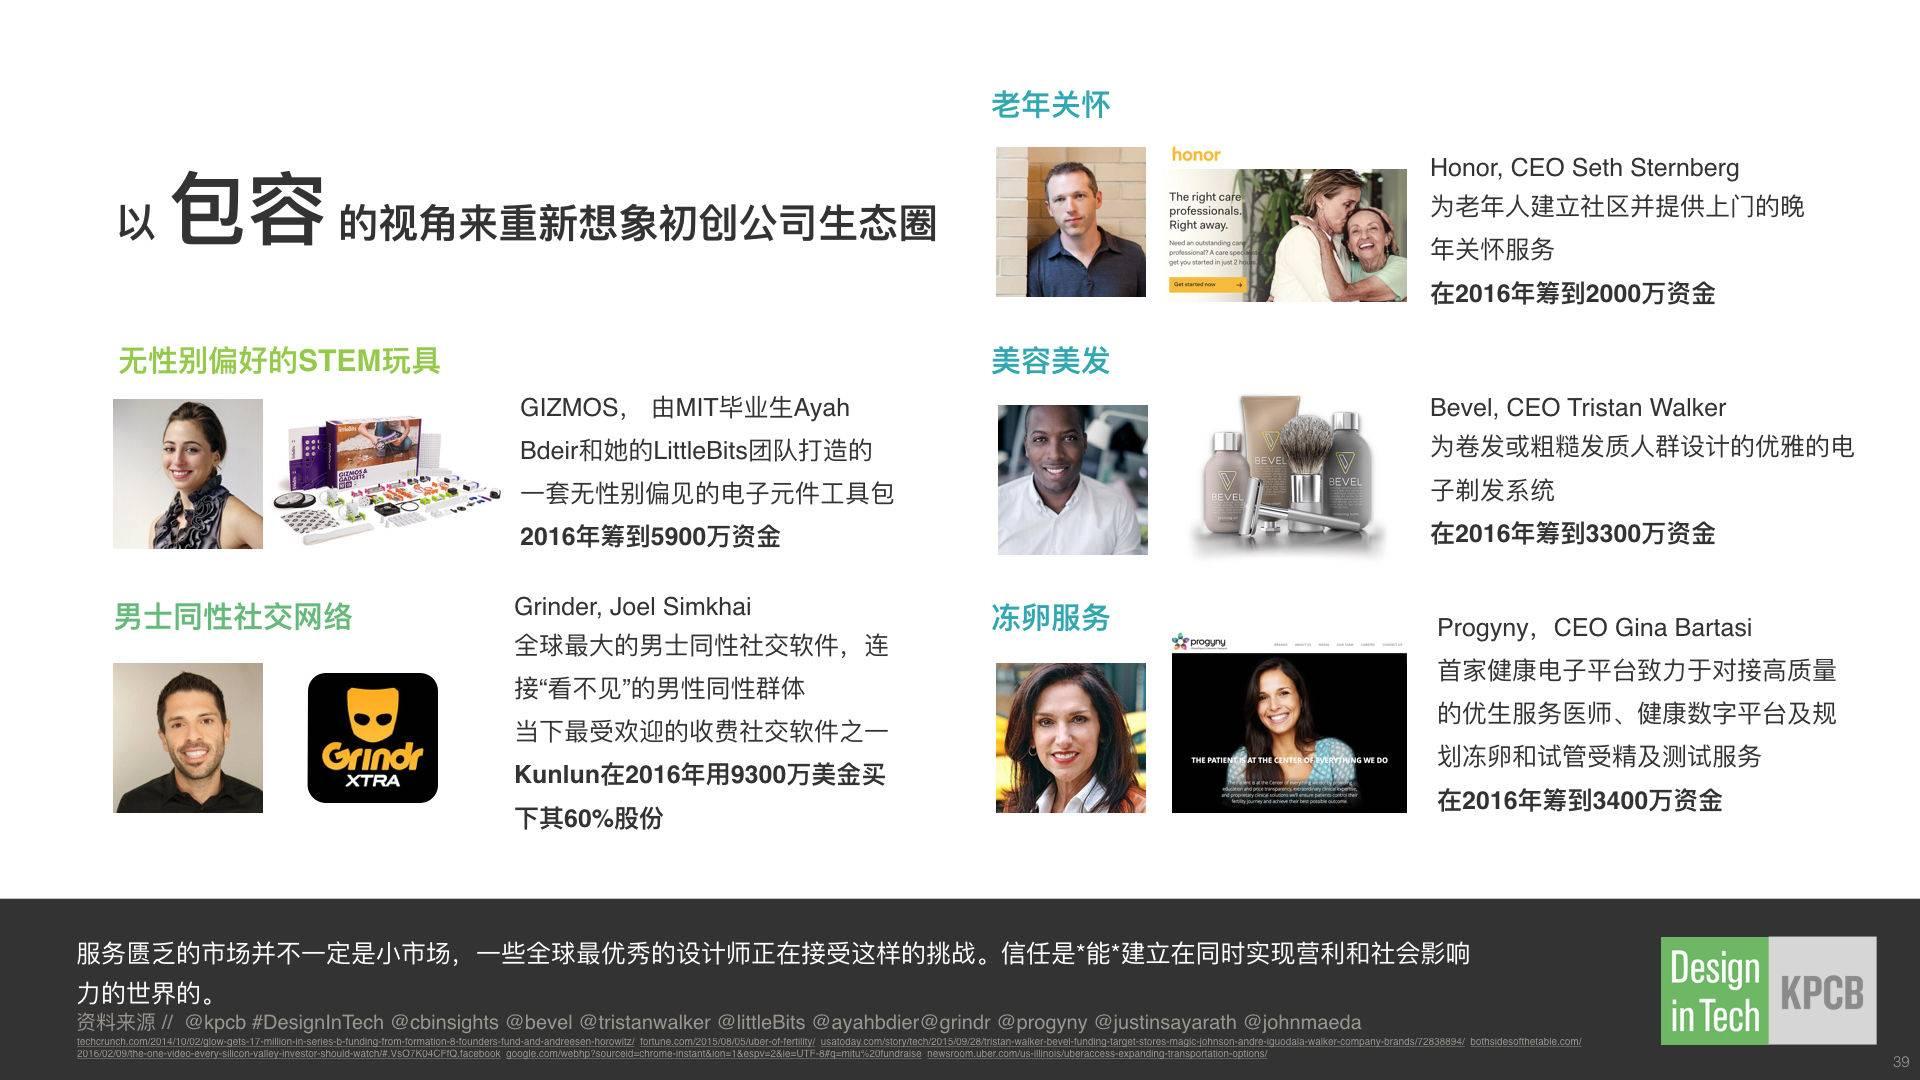 2016DesignInTech科技中的设计(Chinese).039.jpeg